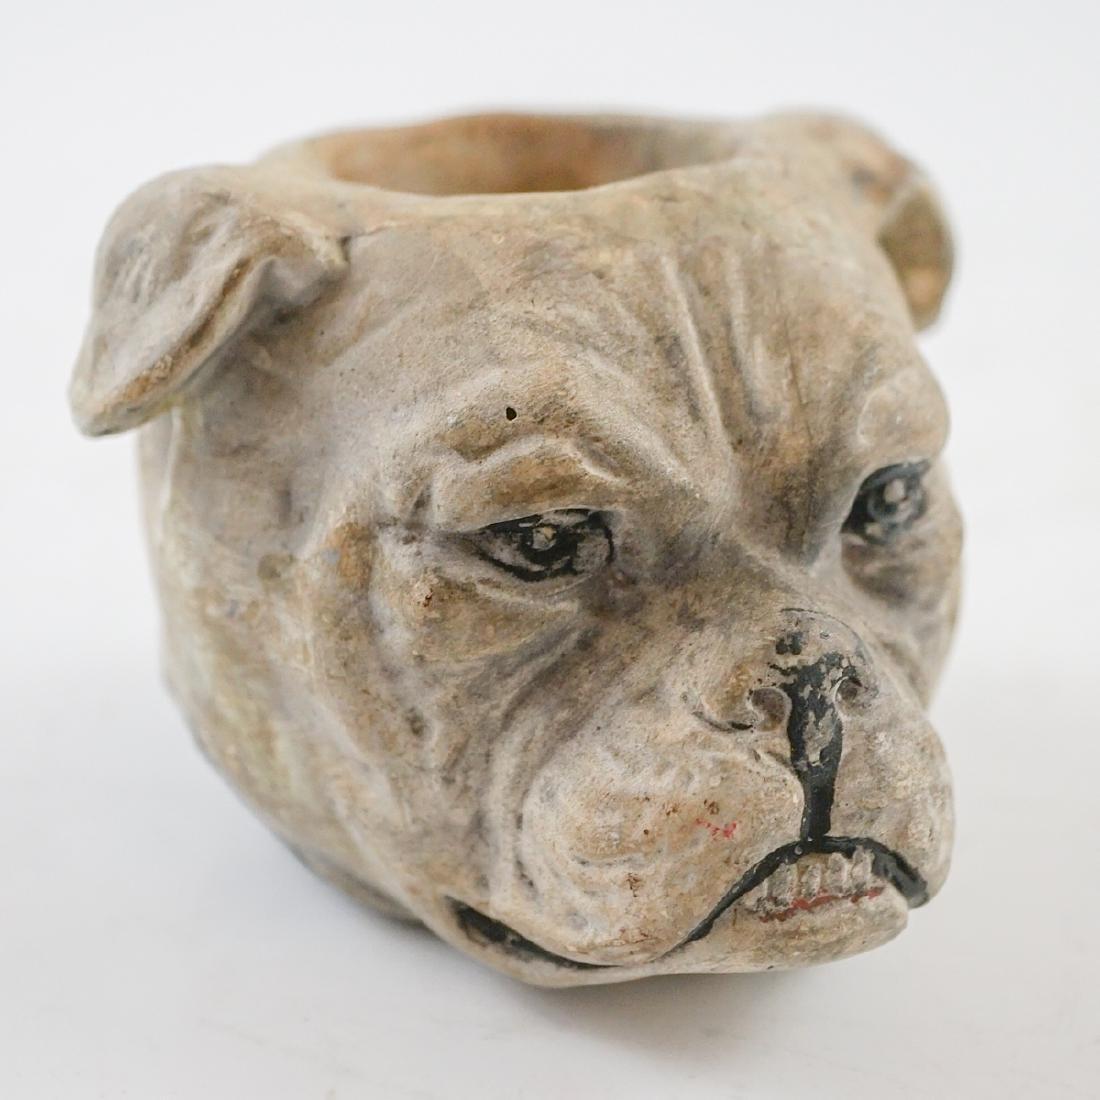 Group of Dog Figurines - 5